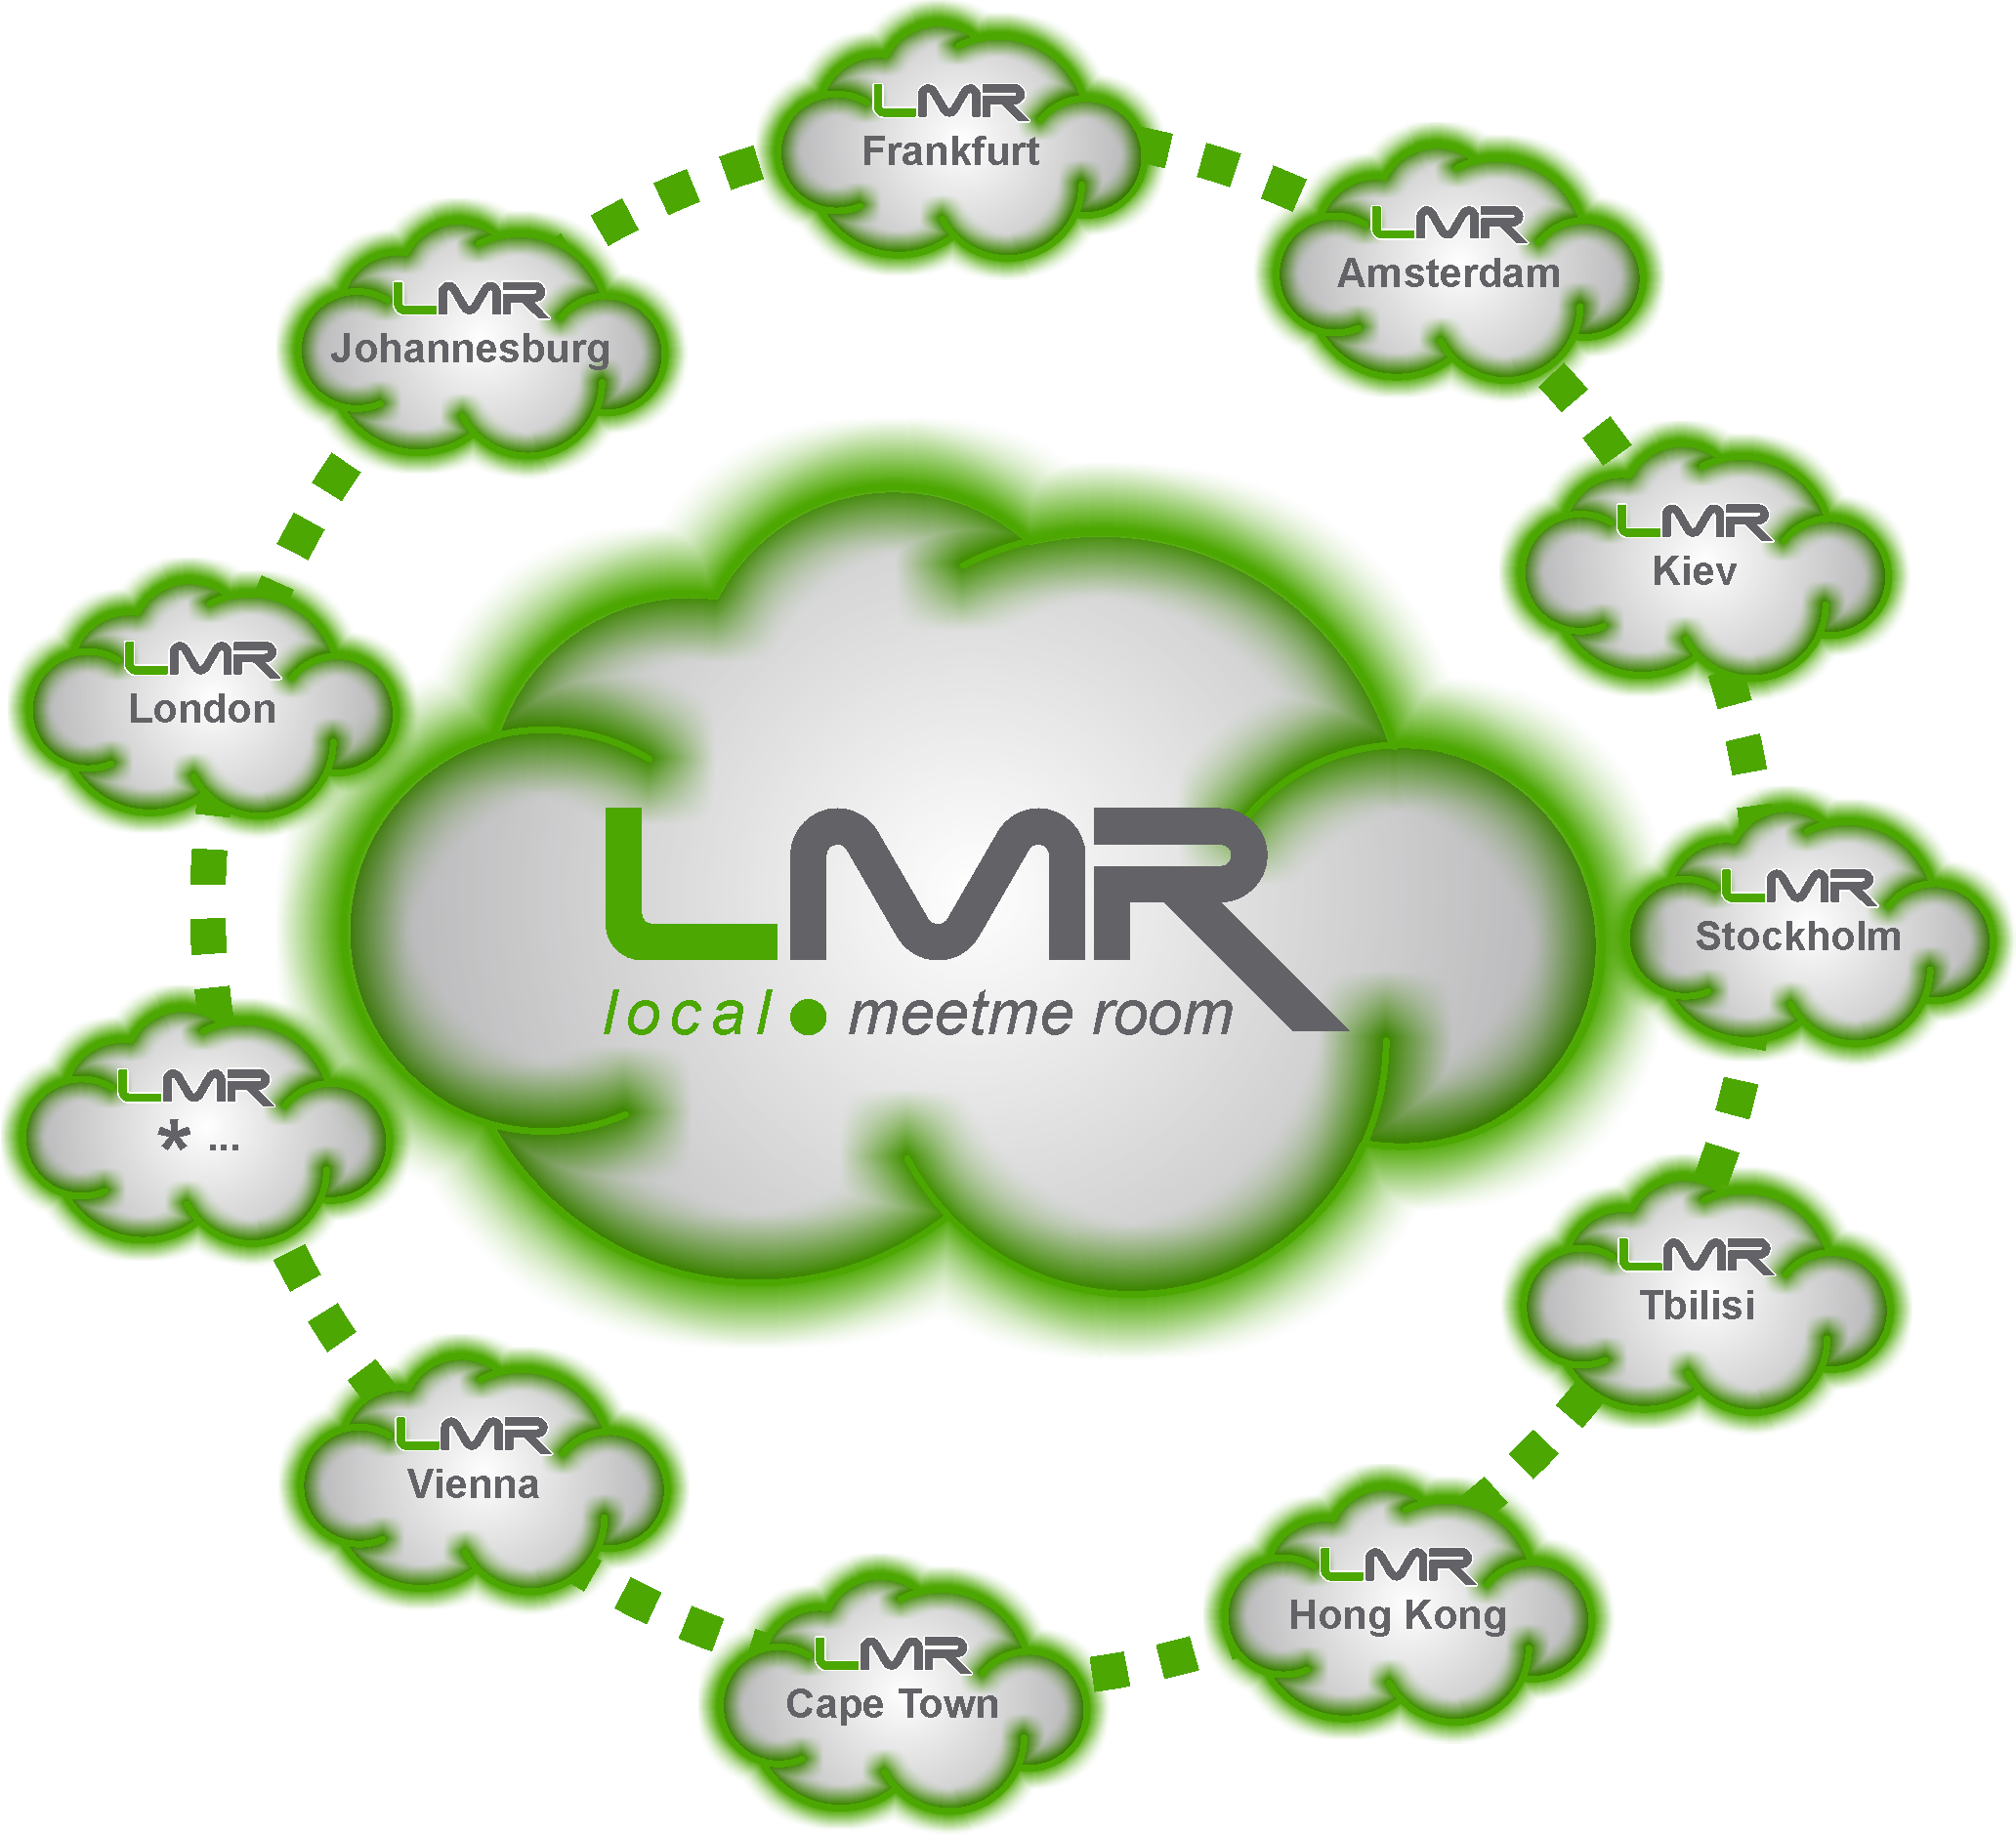 lmr locations